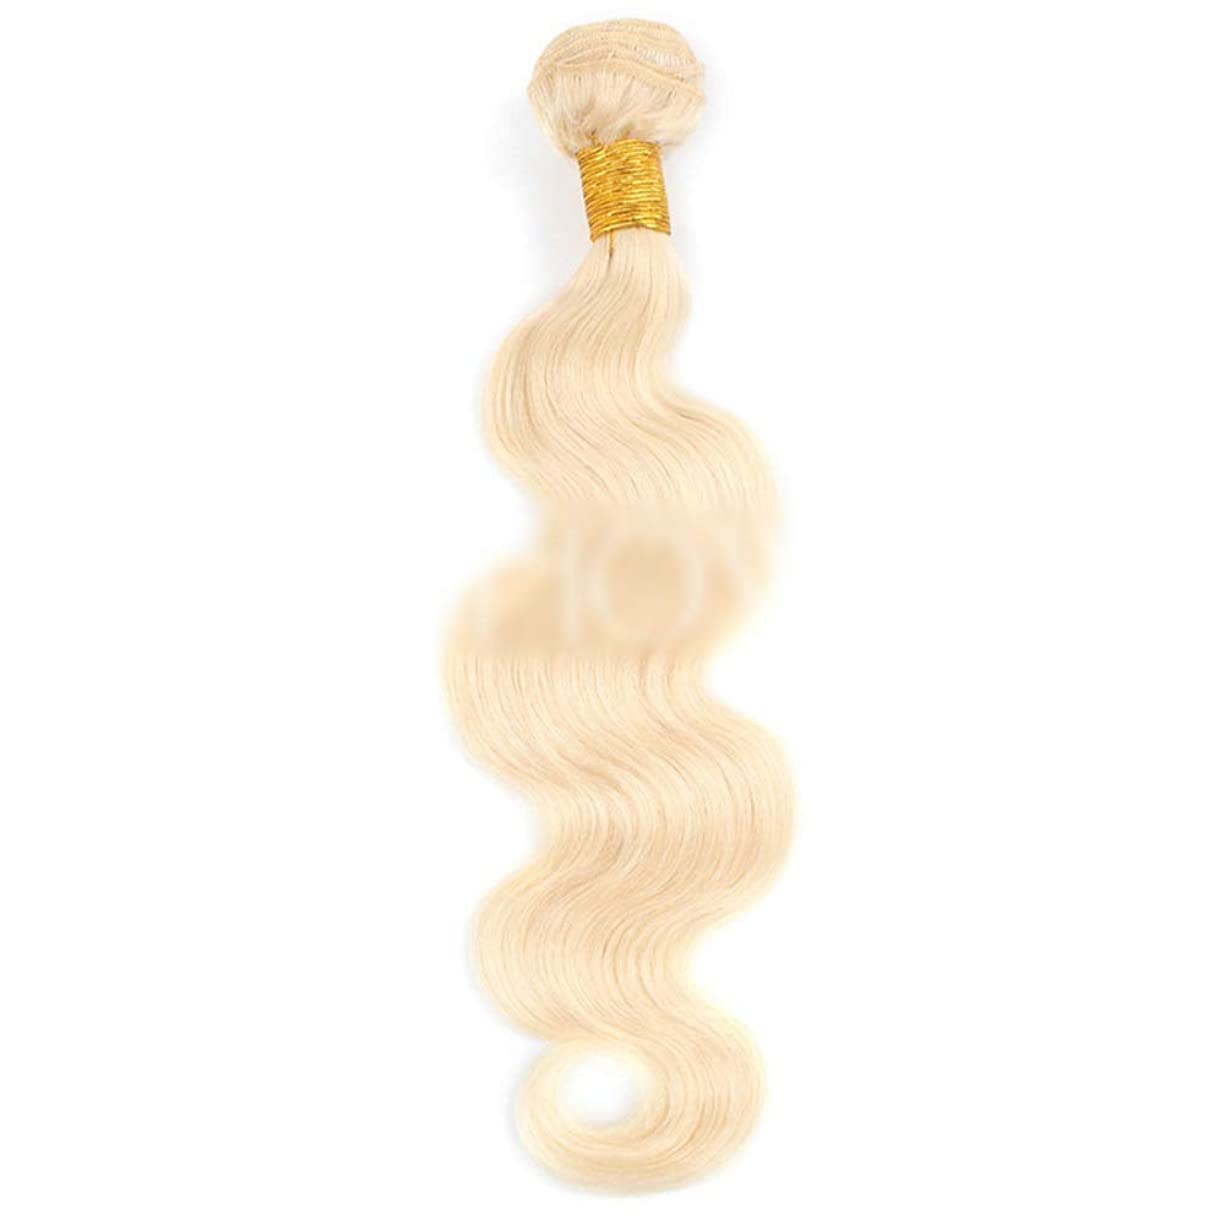 HOHYLLYA ブロンドの人間の髪織りバンドル本物のRemyナチュラルヘアエクステンション横糸 - ボディウェーブ - #613ブロンド(100g / 1バンドル、10インチ-26インチ)合成髪レースかつらロールプレイングウィッグロング&ショート女性自然 (色 : Blonde, サイズ : 24 inch)